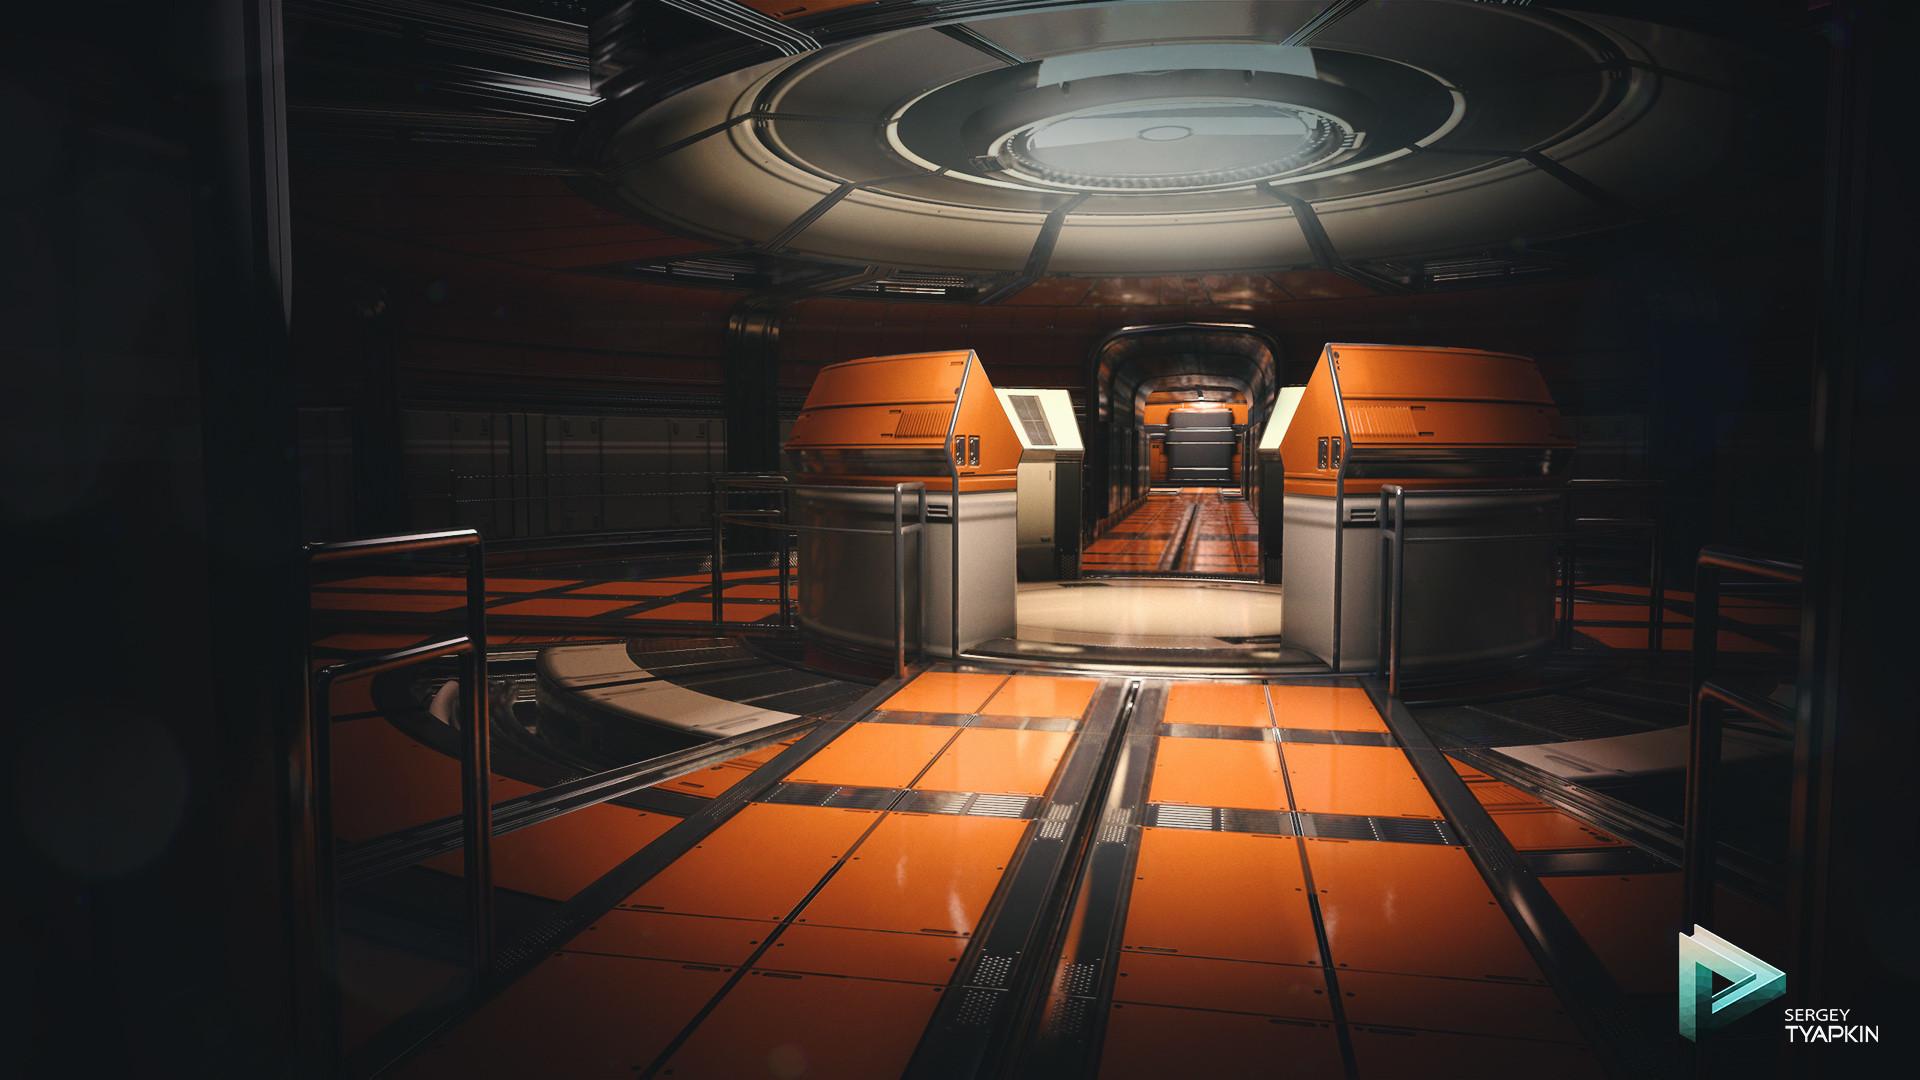 Sergey tyapkin sci fi environment 2